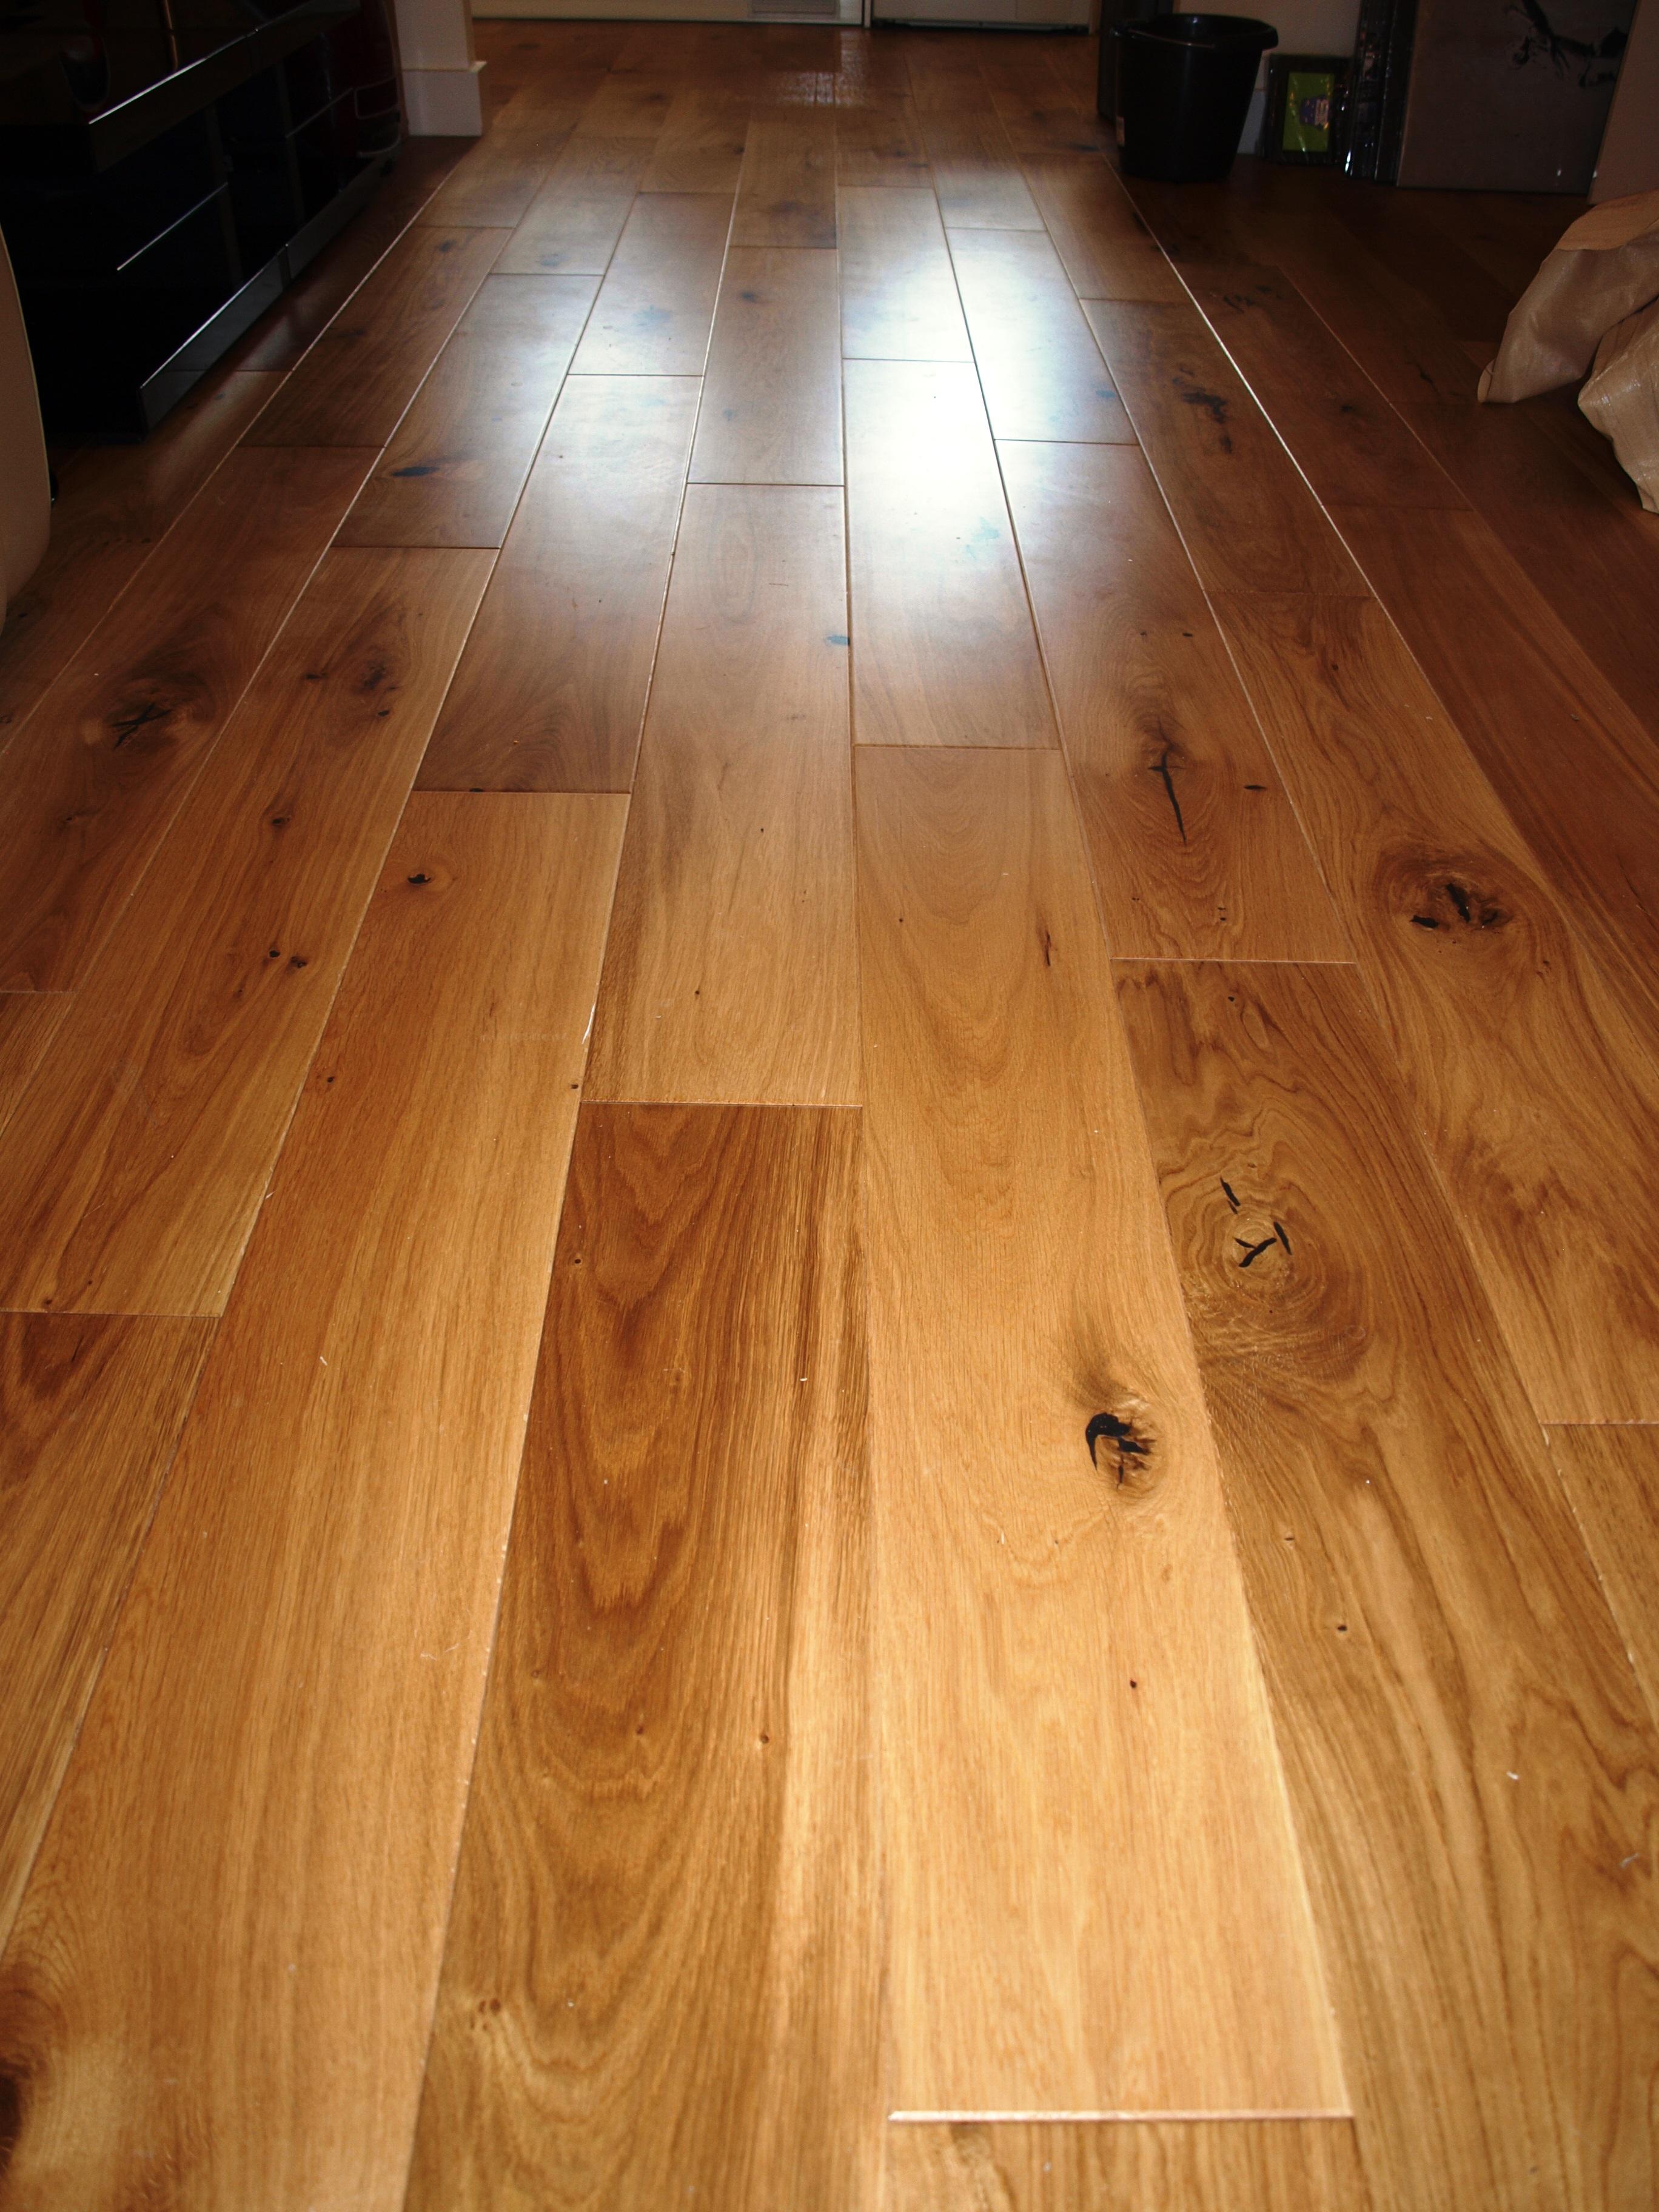 Laminate flooring slk services for Laminate flooring services